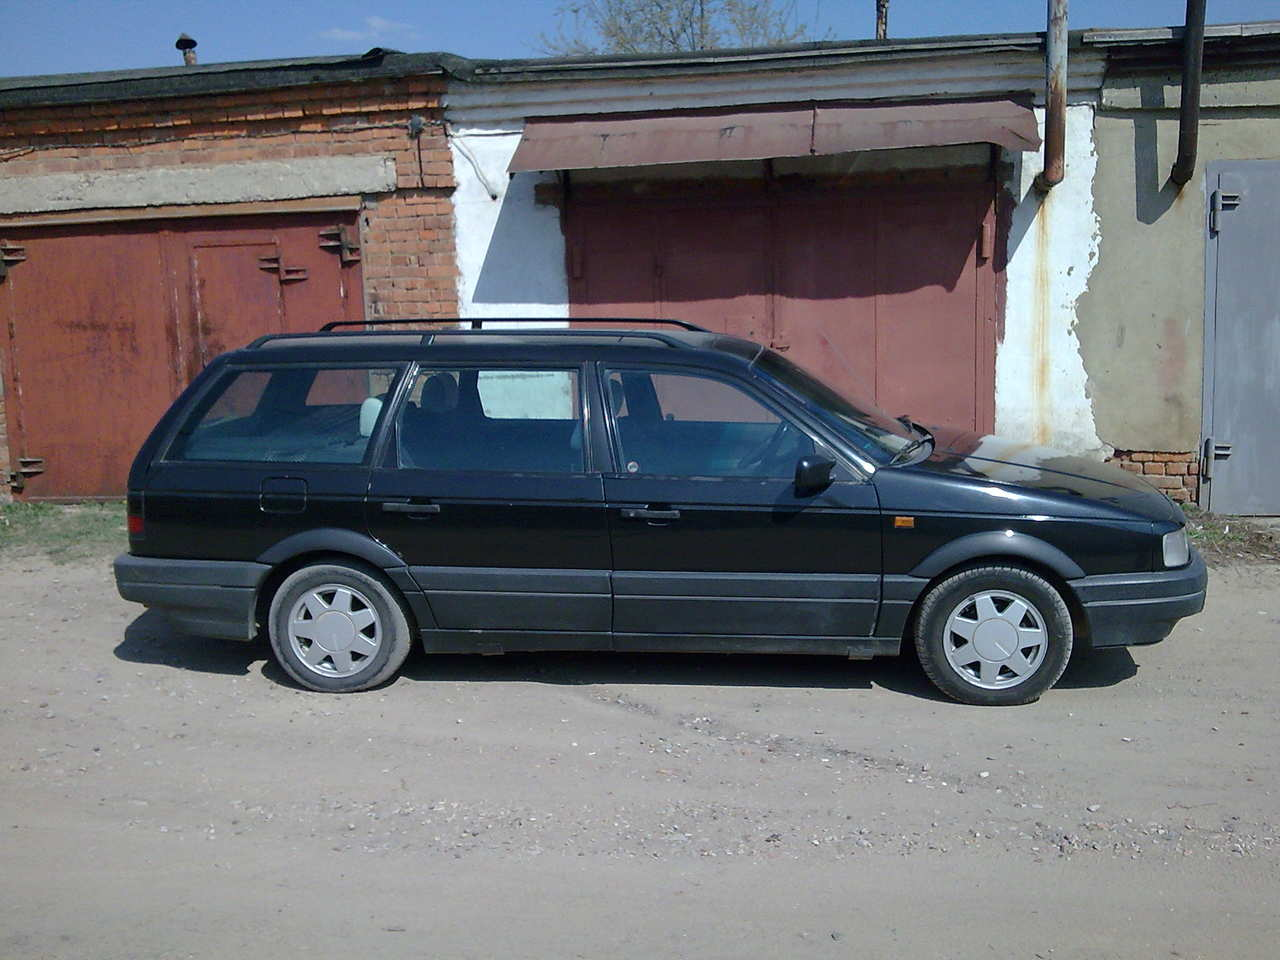 used 1992 volkswagen passat photos 1984cc gasoline ff manual for sale. Black Bedroom Furniture Sets. Home Design Ideas